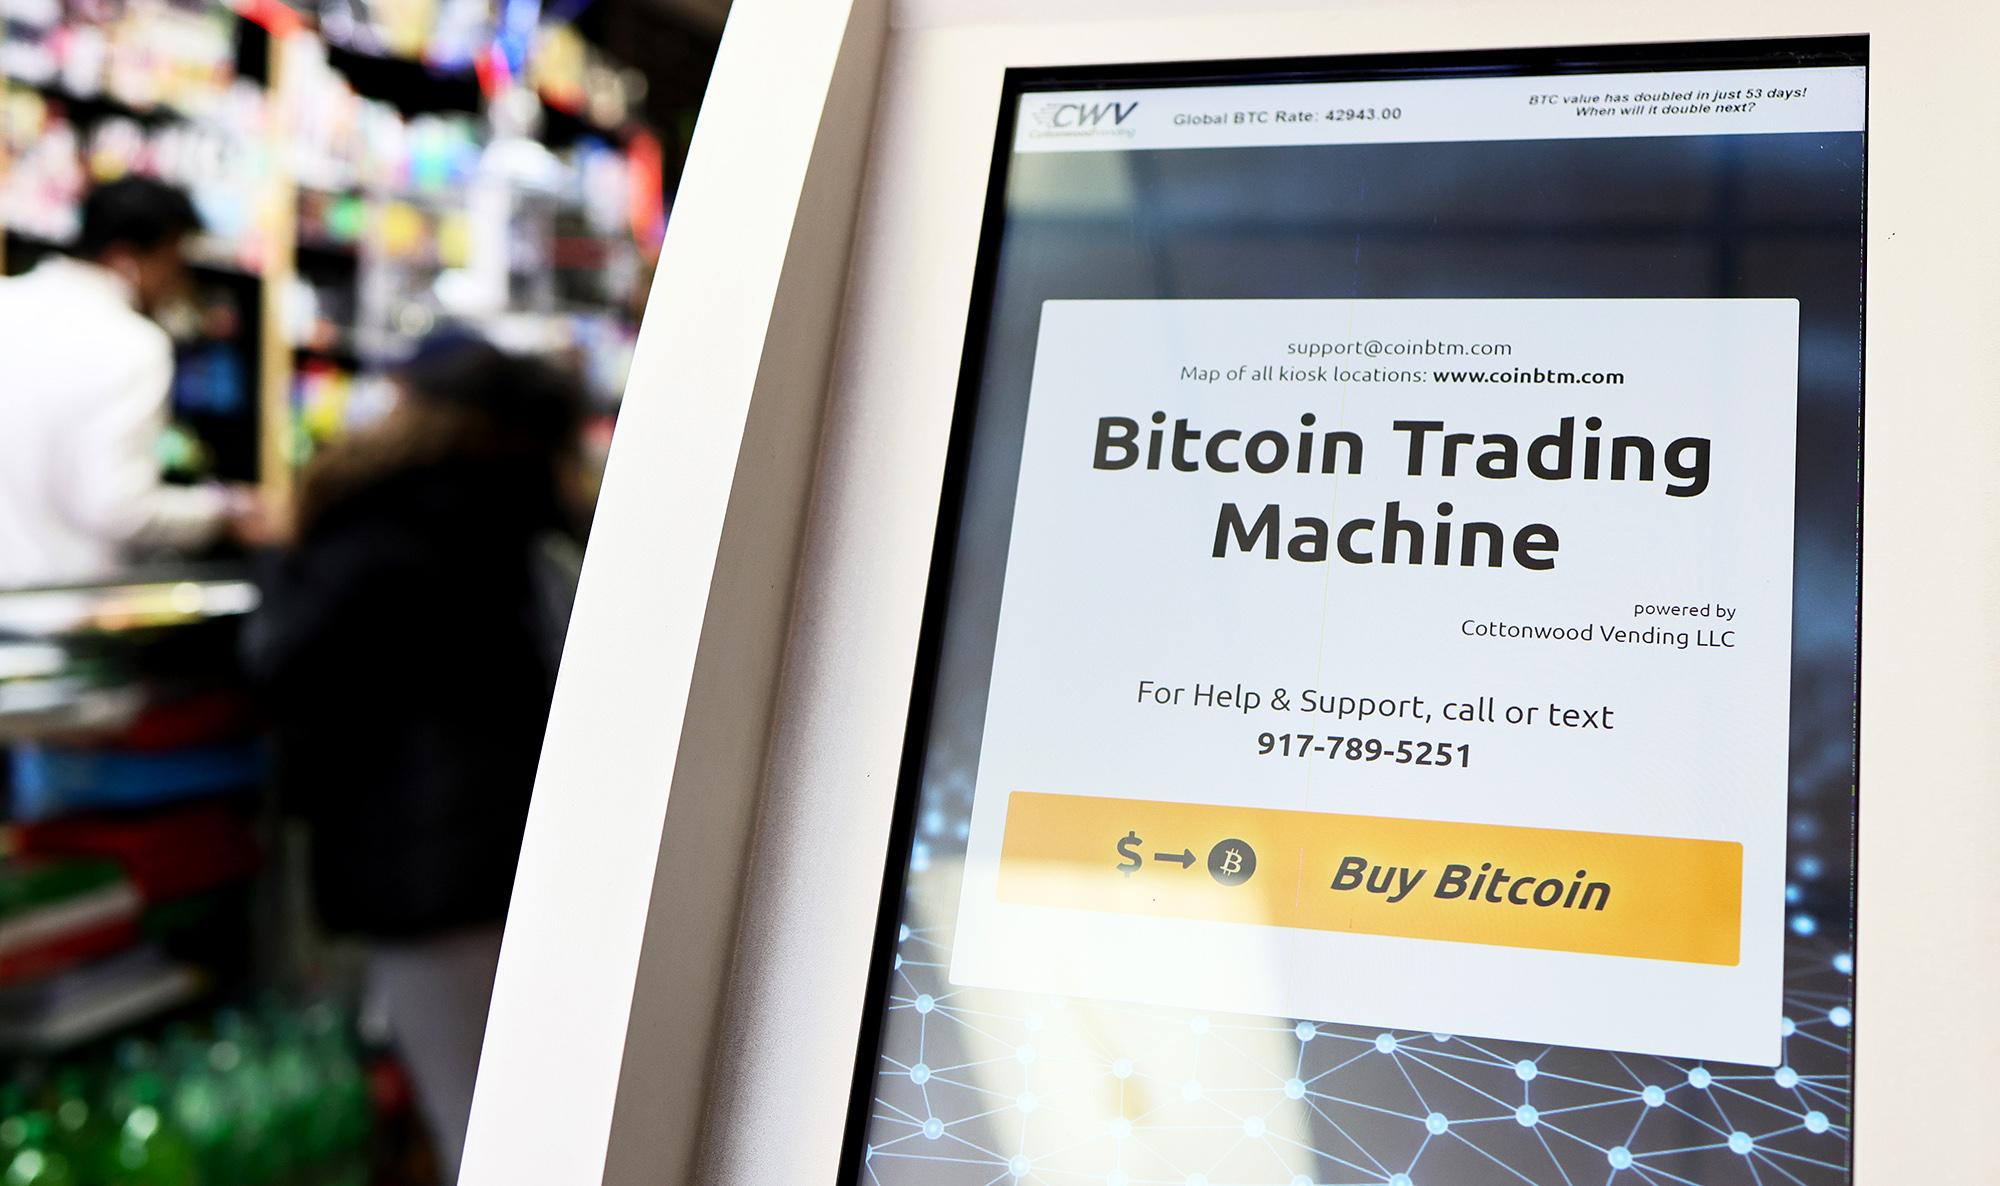 global trading solutions llc bitcoin